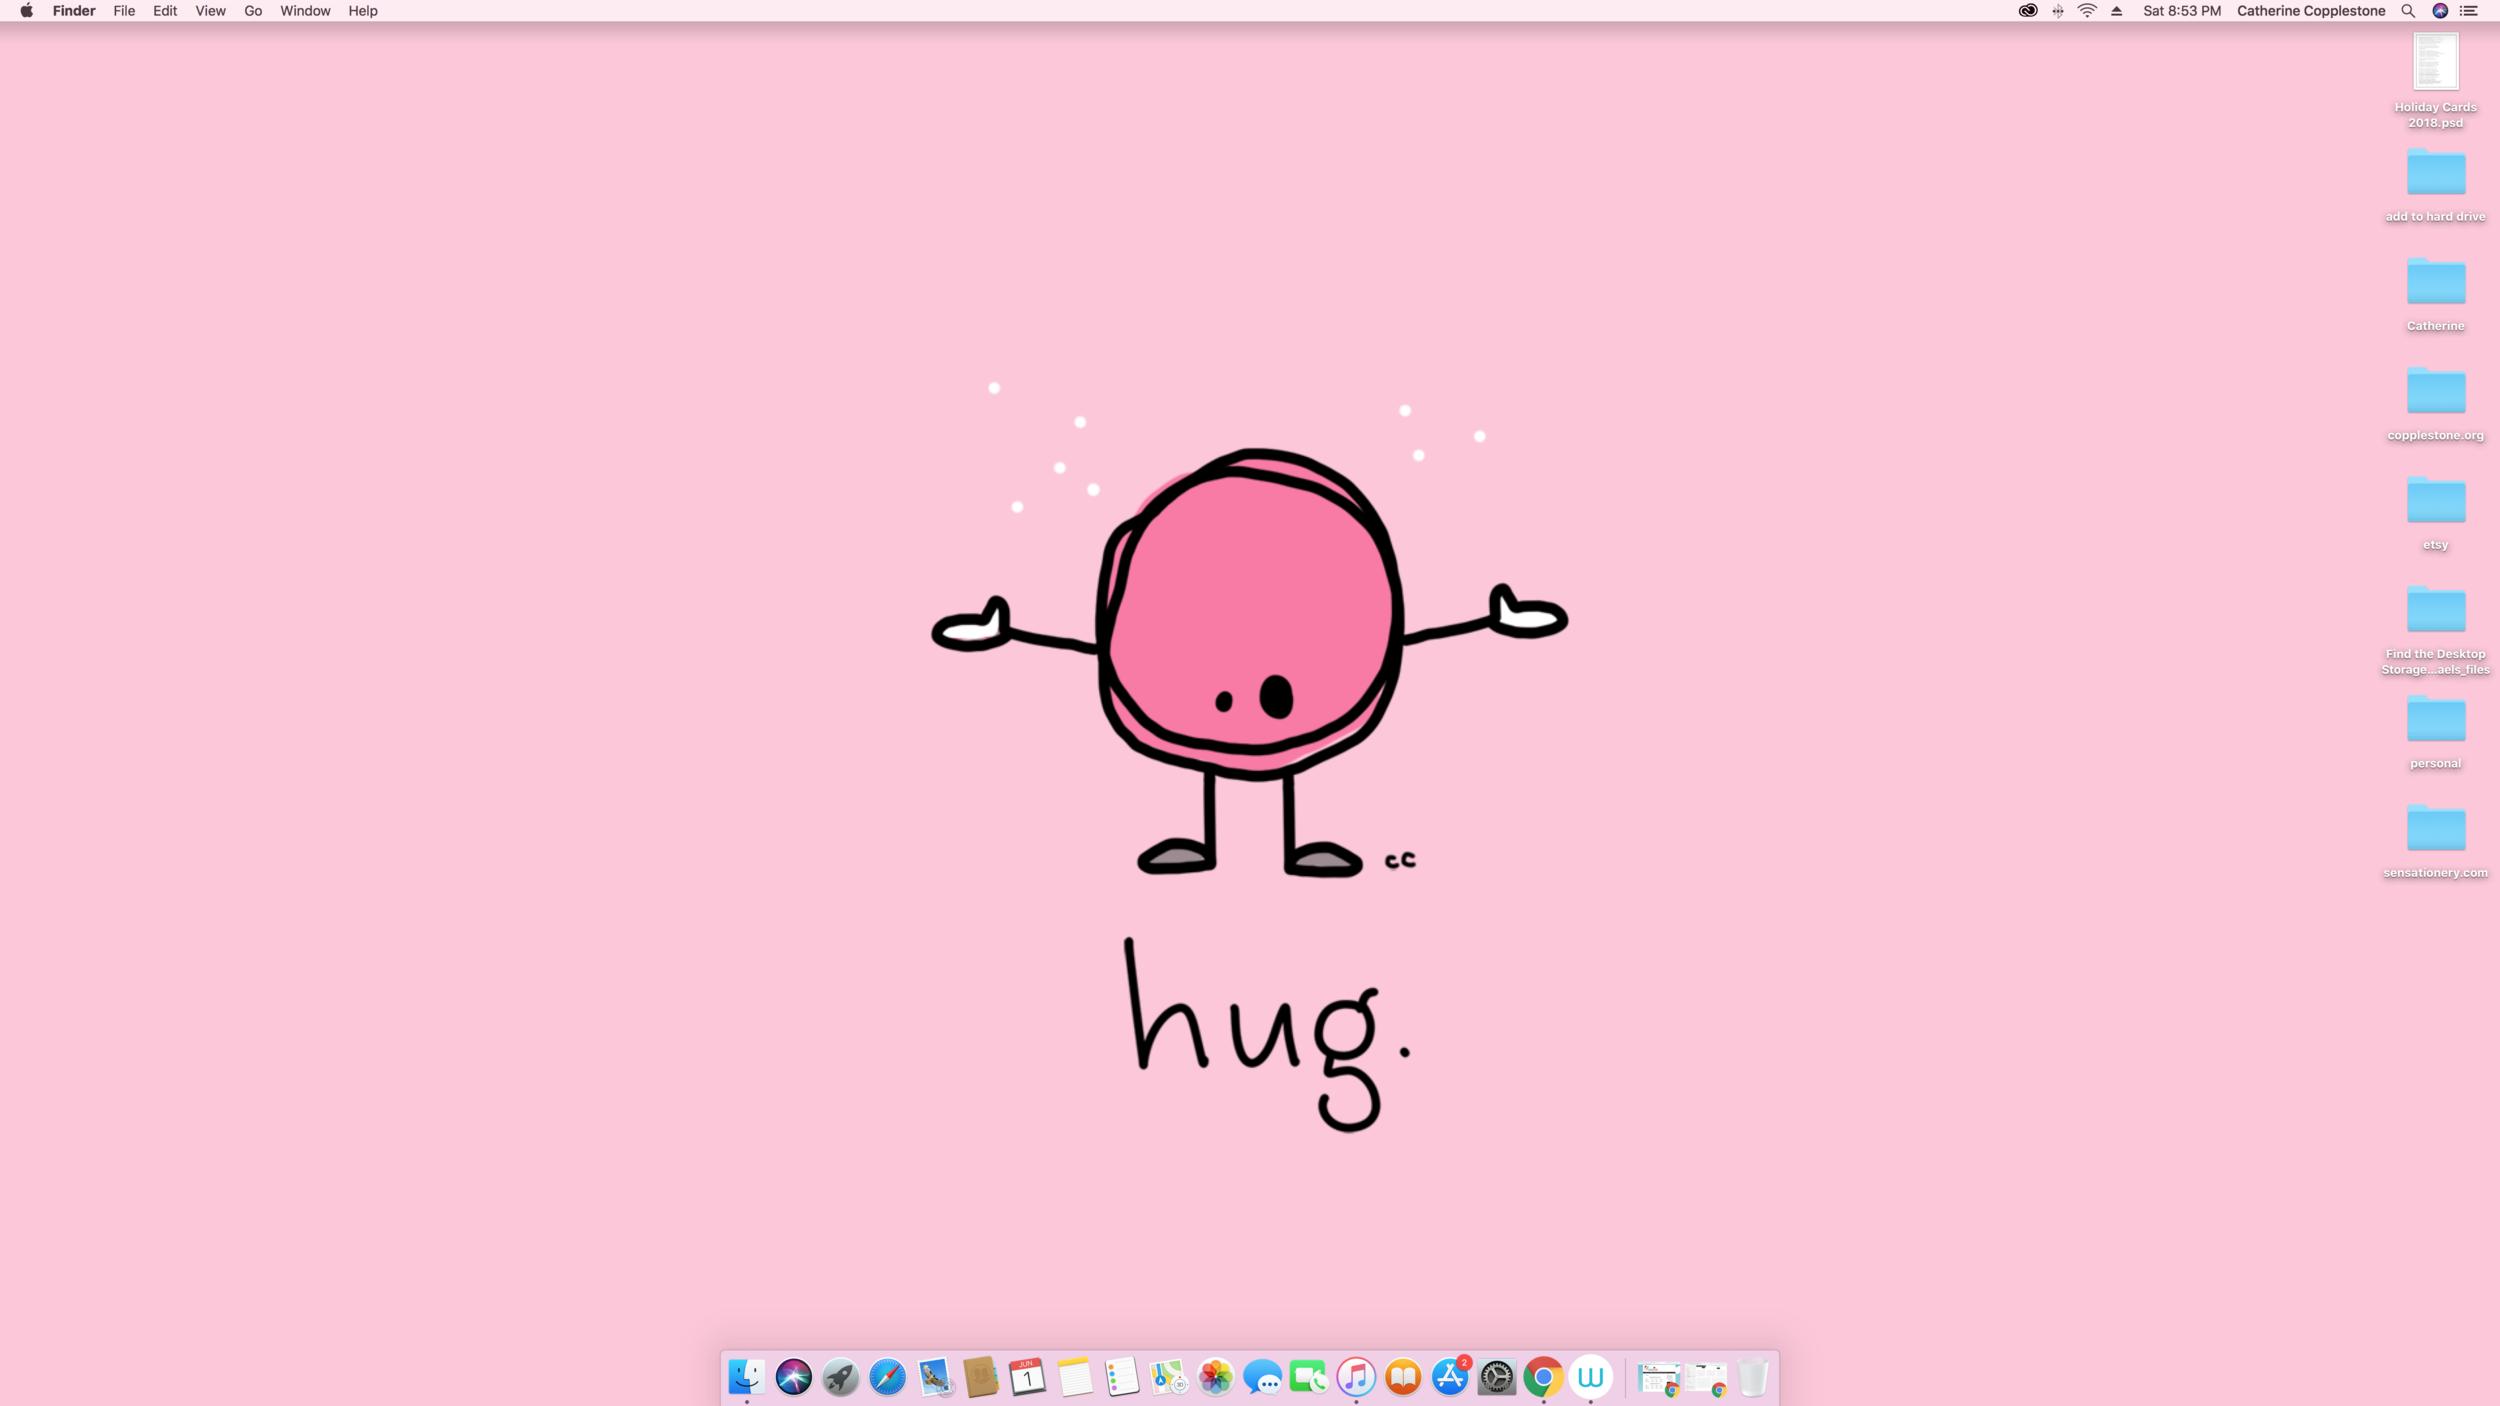 hug. -